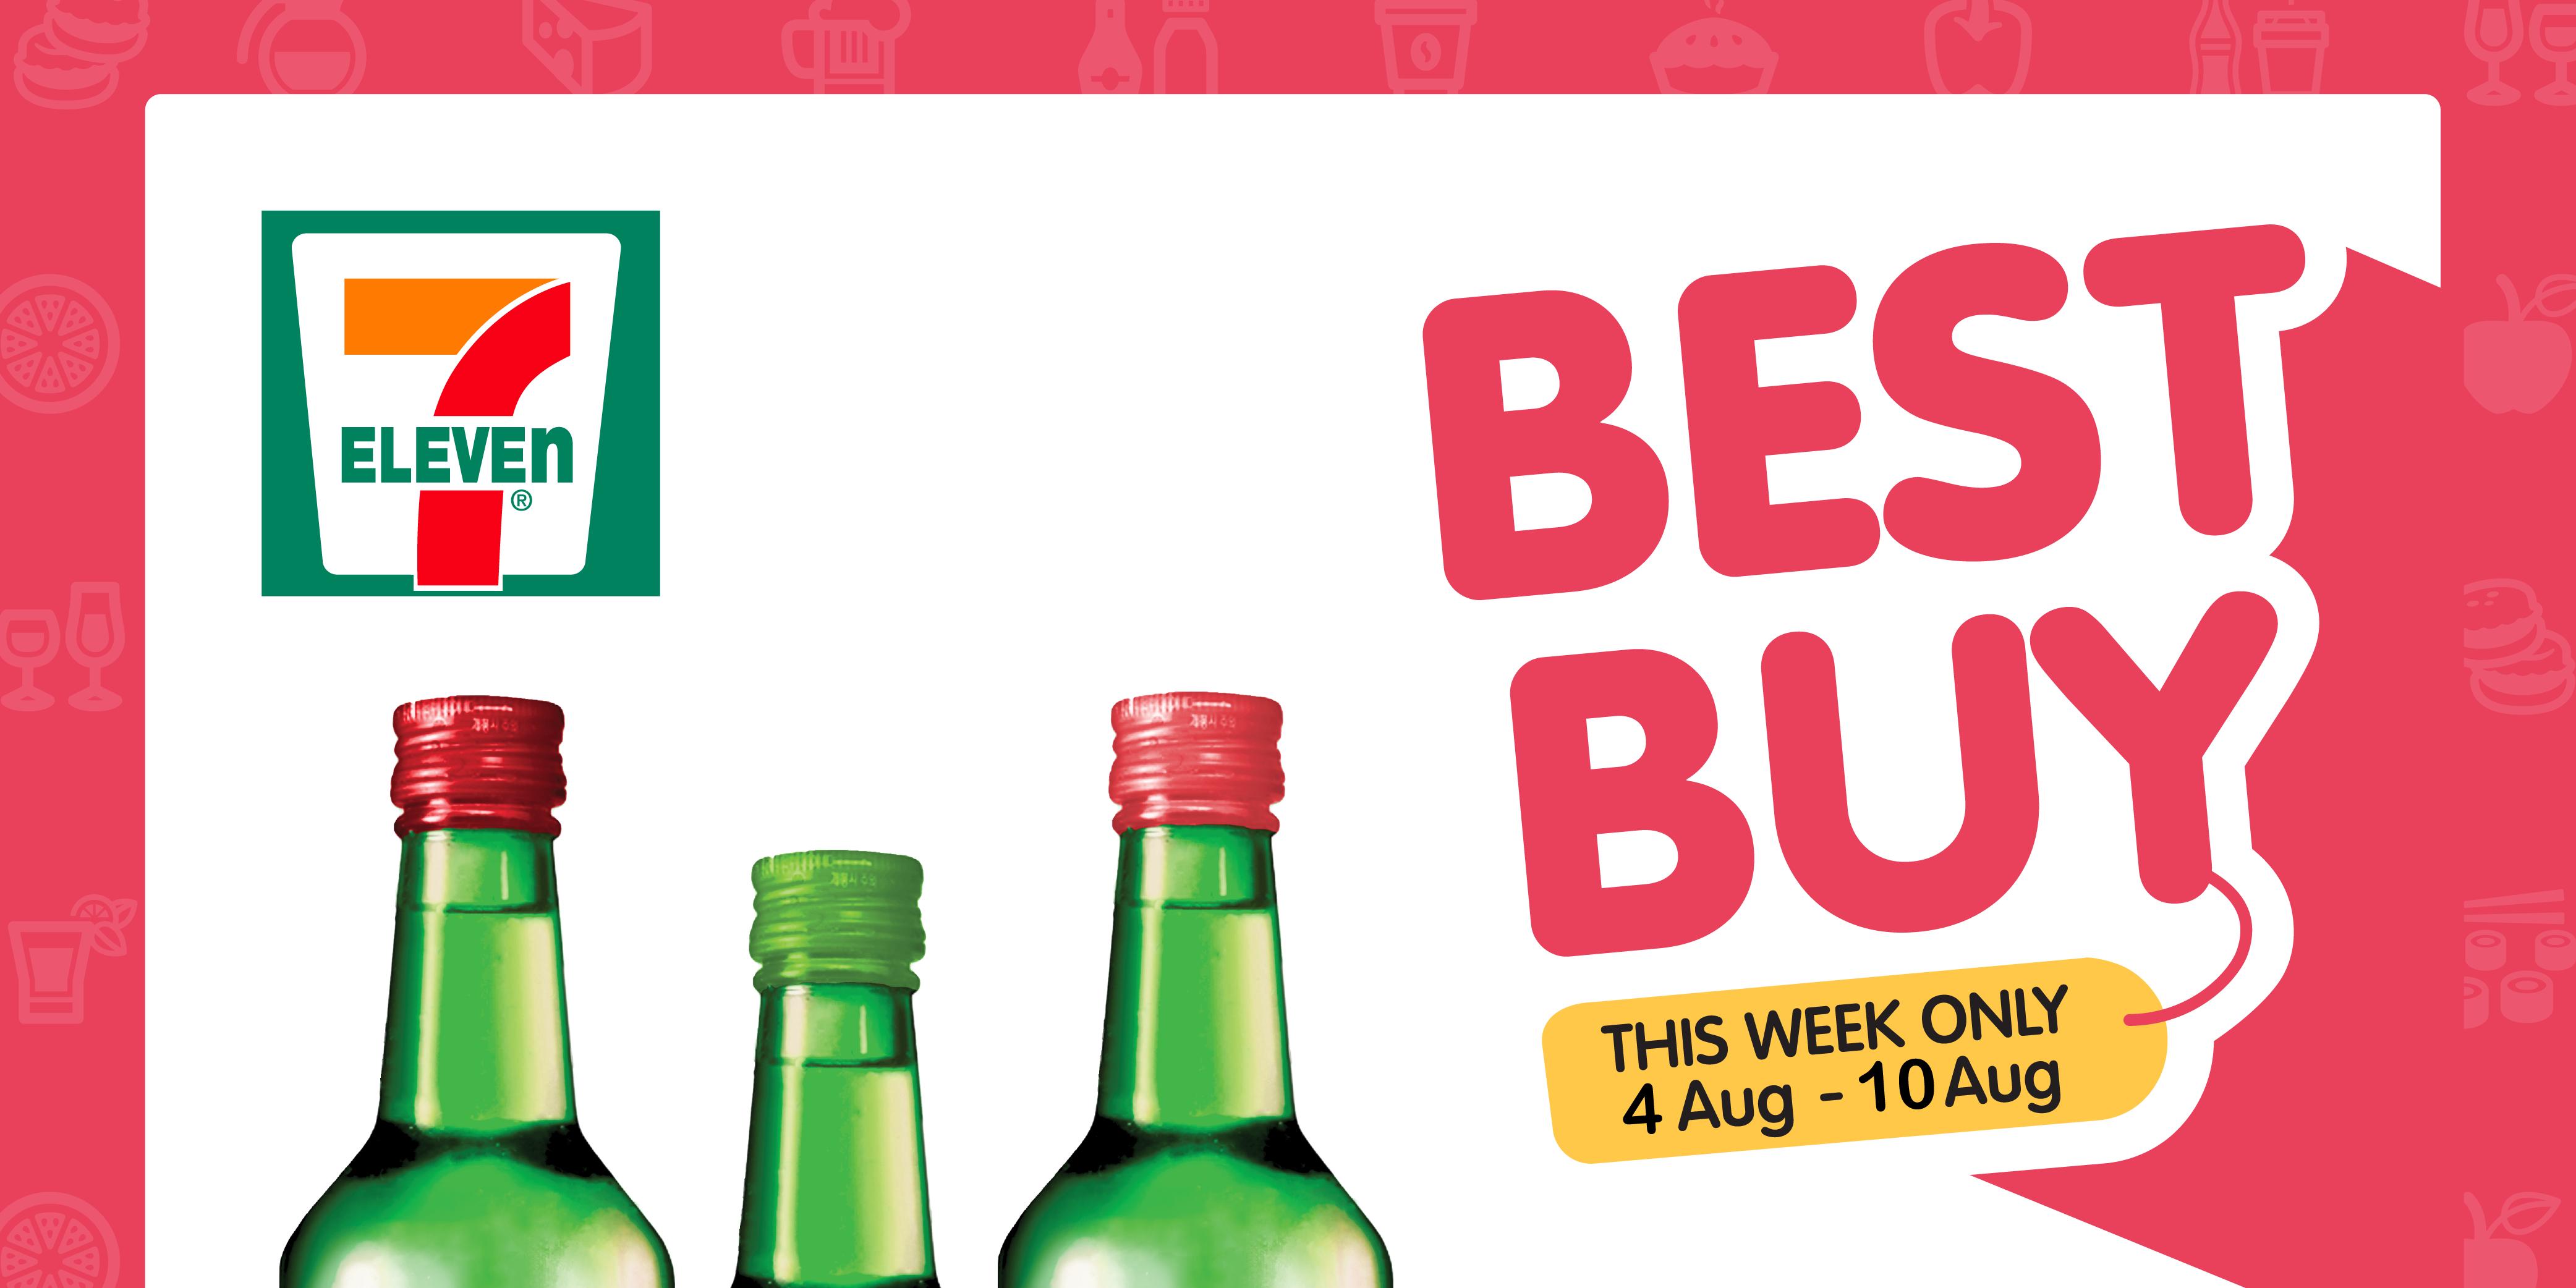 7-Eleven: BEST BUY for Chuga Soju! (4 Aug – 10 Aug)